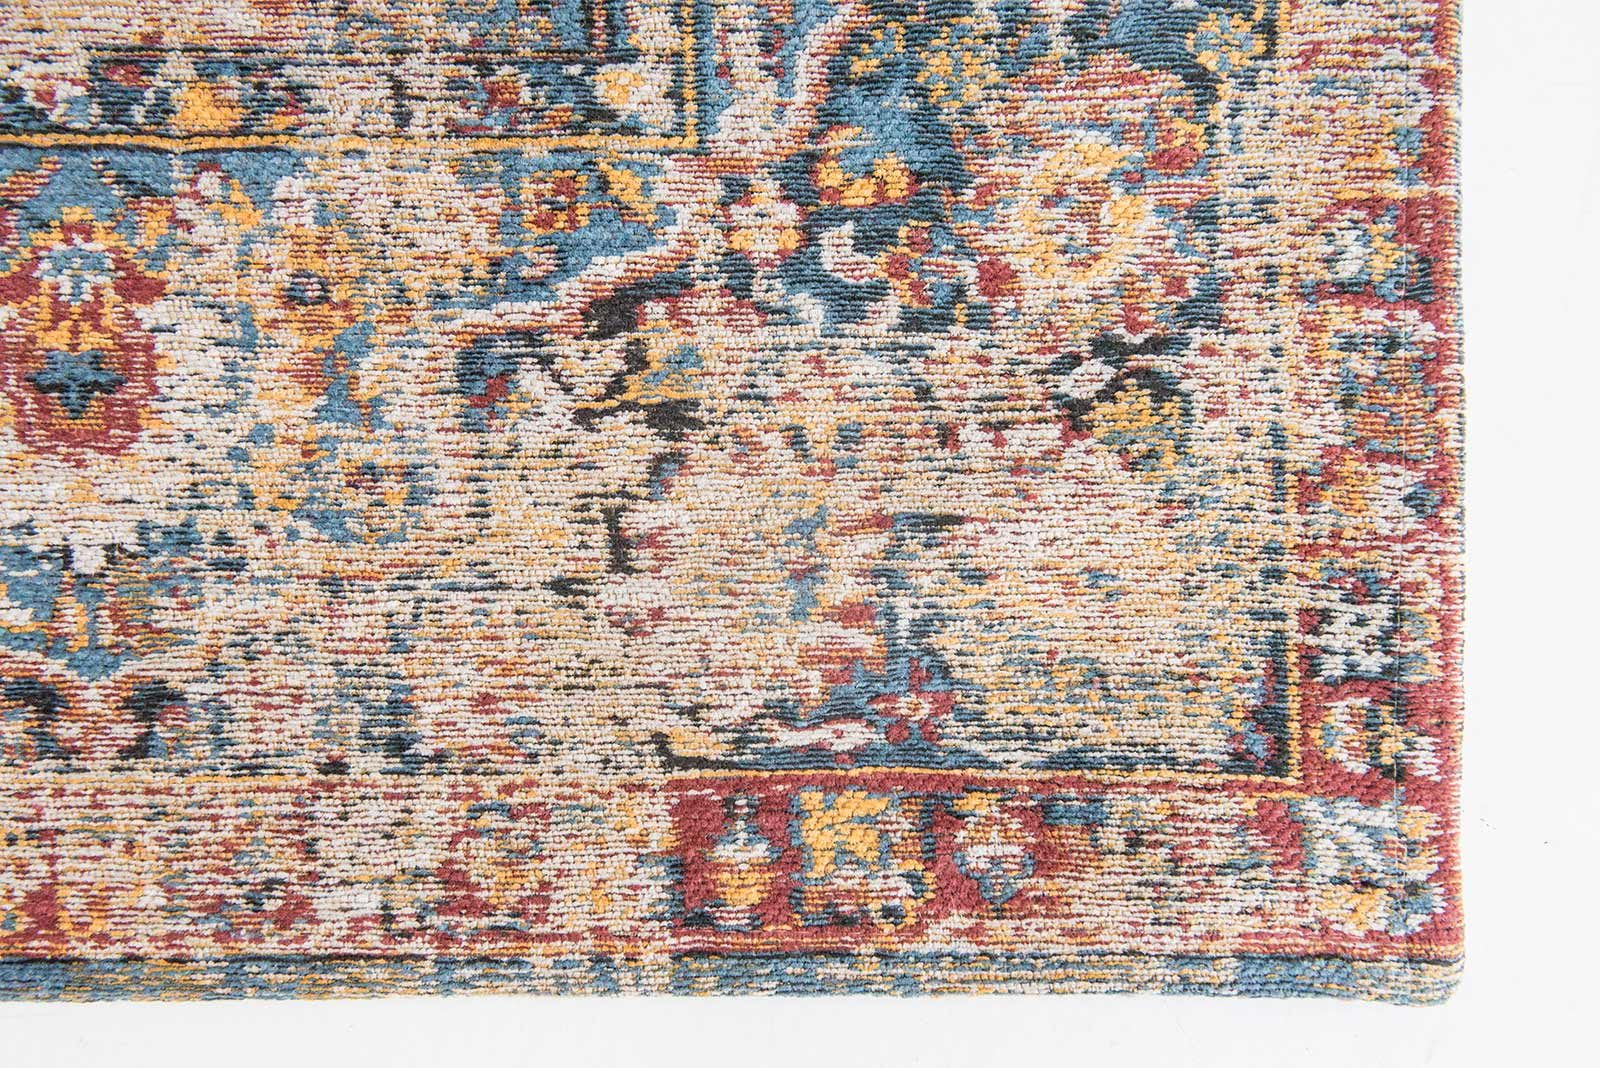 vloerkleed Louis De Poortere LX8713 Antiquarian Antique Bakthiari Khedive Multi corner